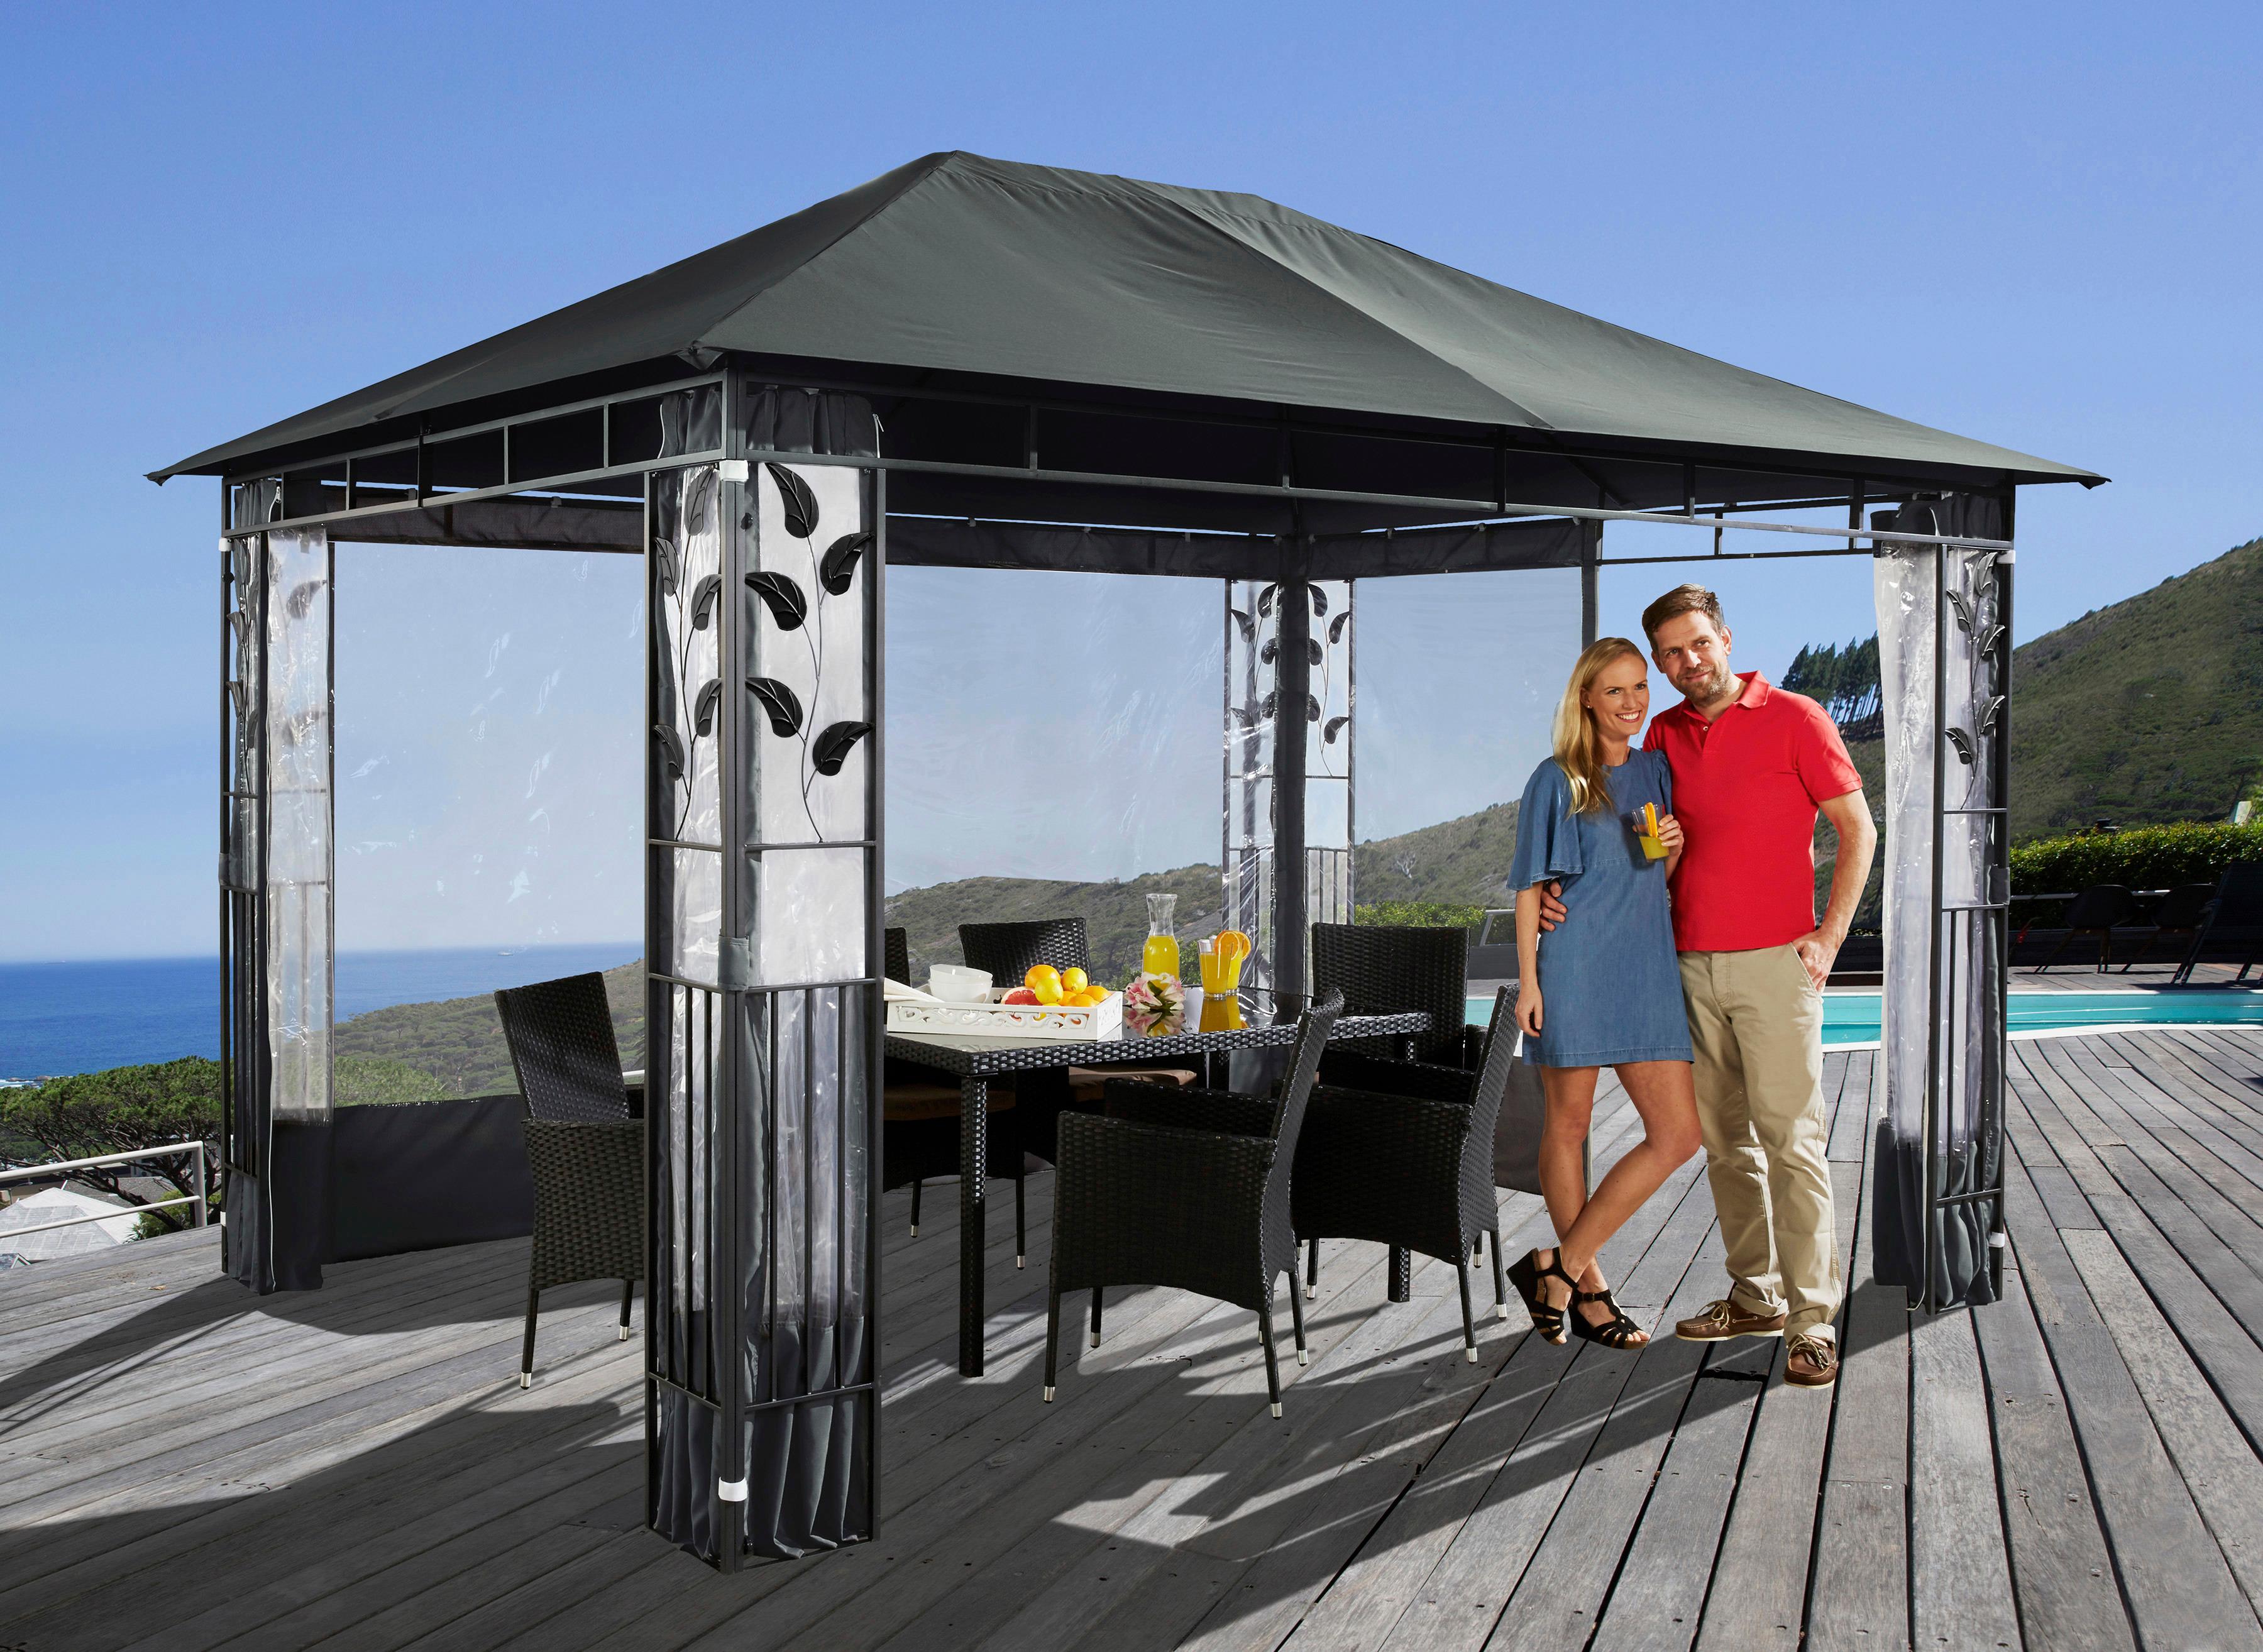 pavillon ersatzdach 3x4m grasekamp ersatzdach 3x4m gartenpavillon nizza grau pavillon. Black Bedroom Furniture Sets. Home Design Ideas